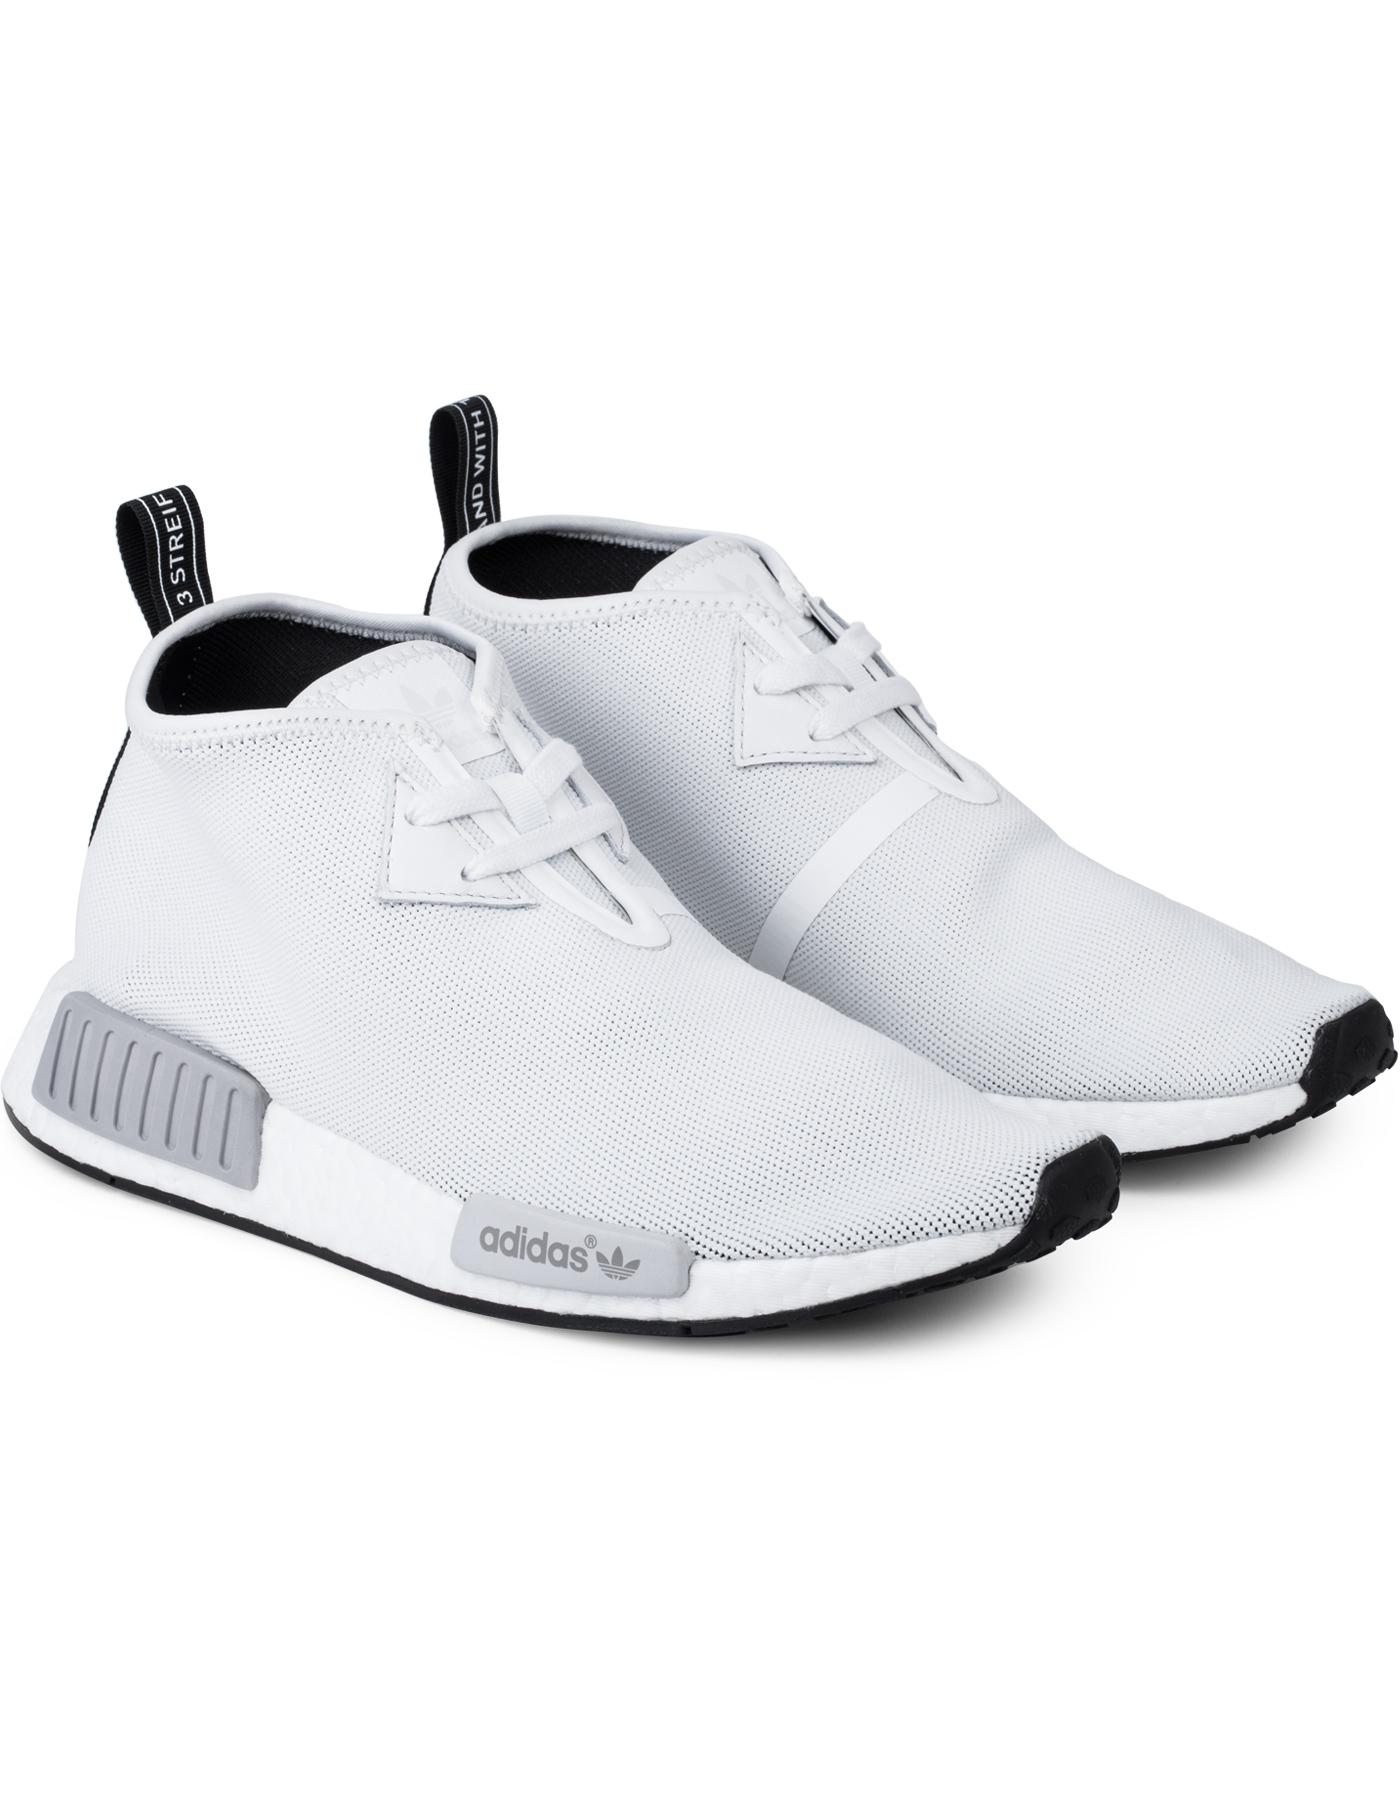 adidas nmd c1 white